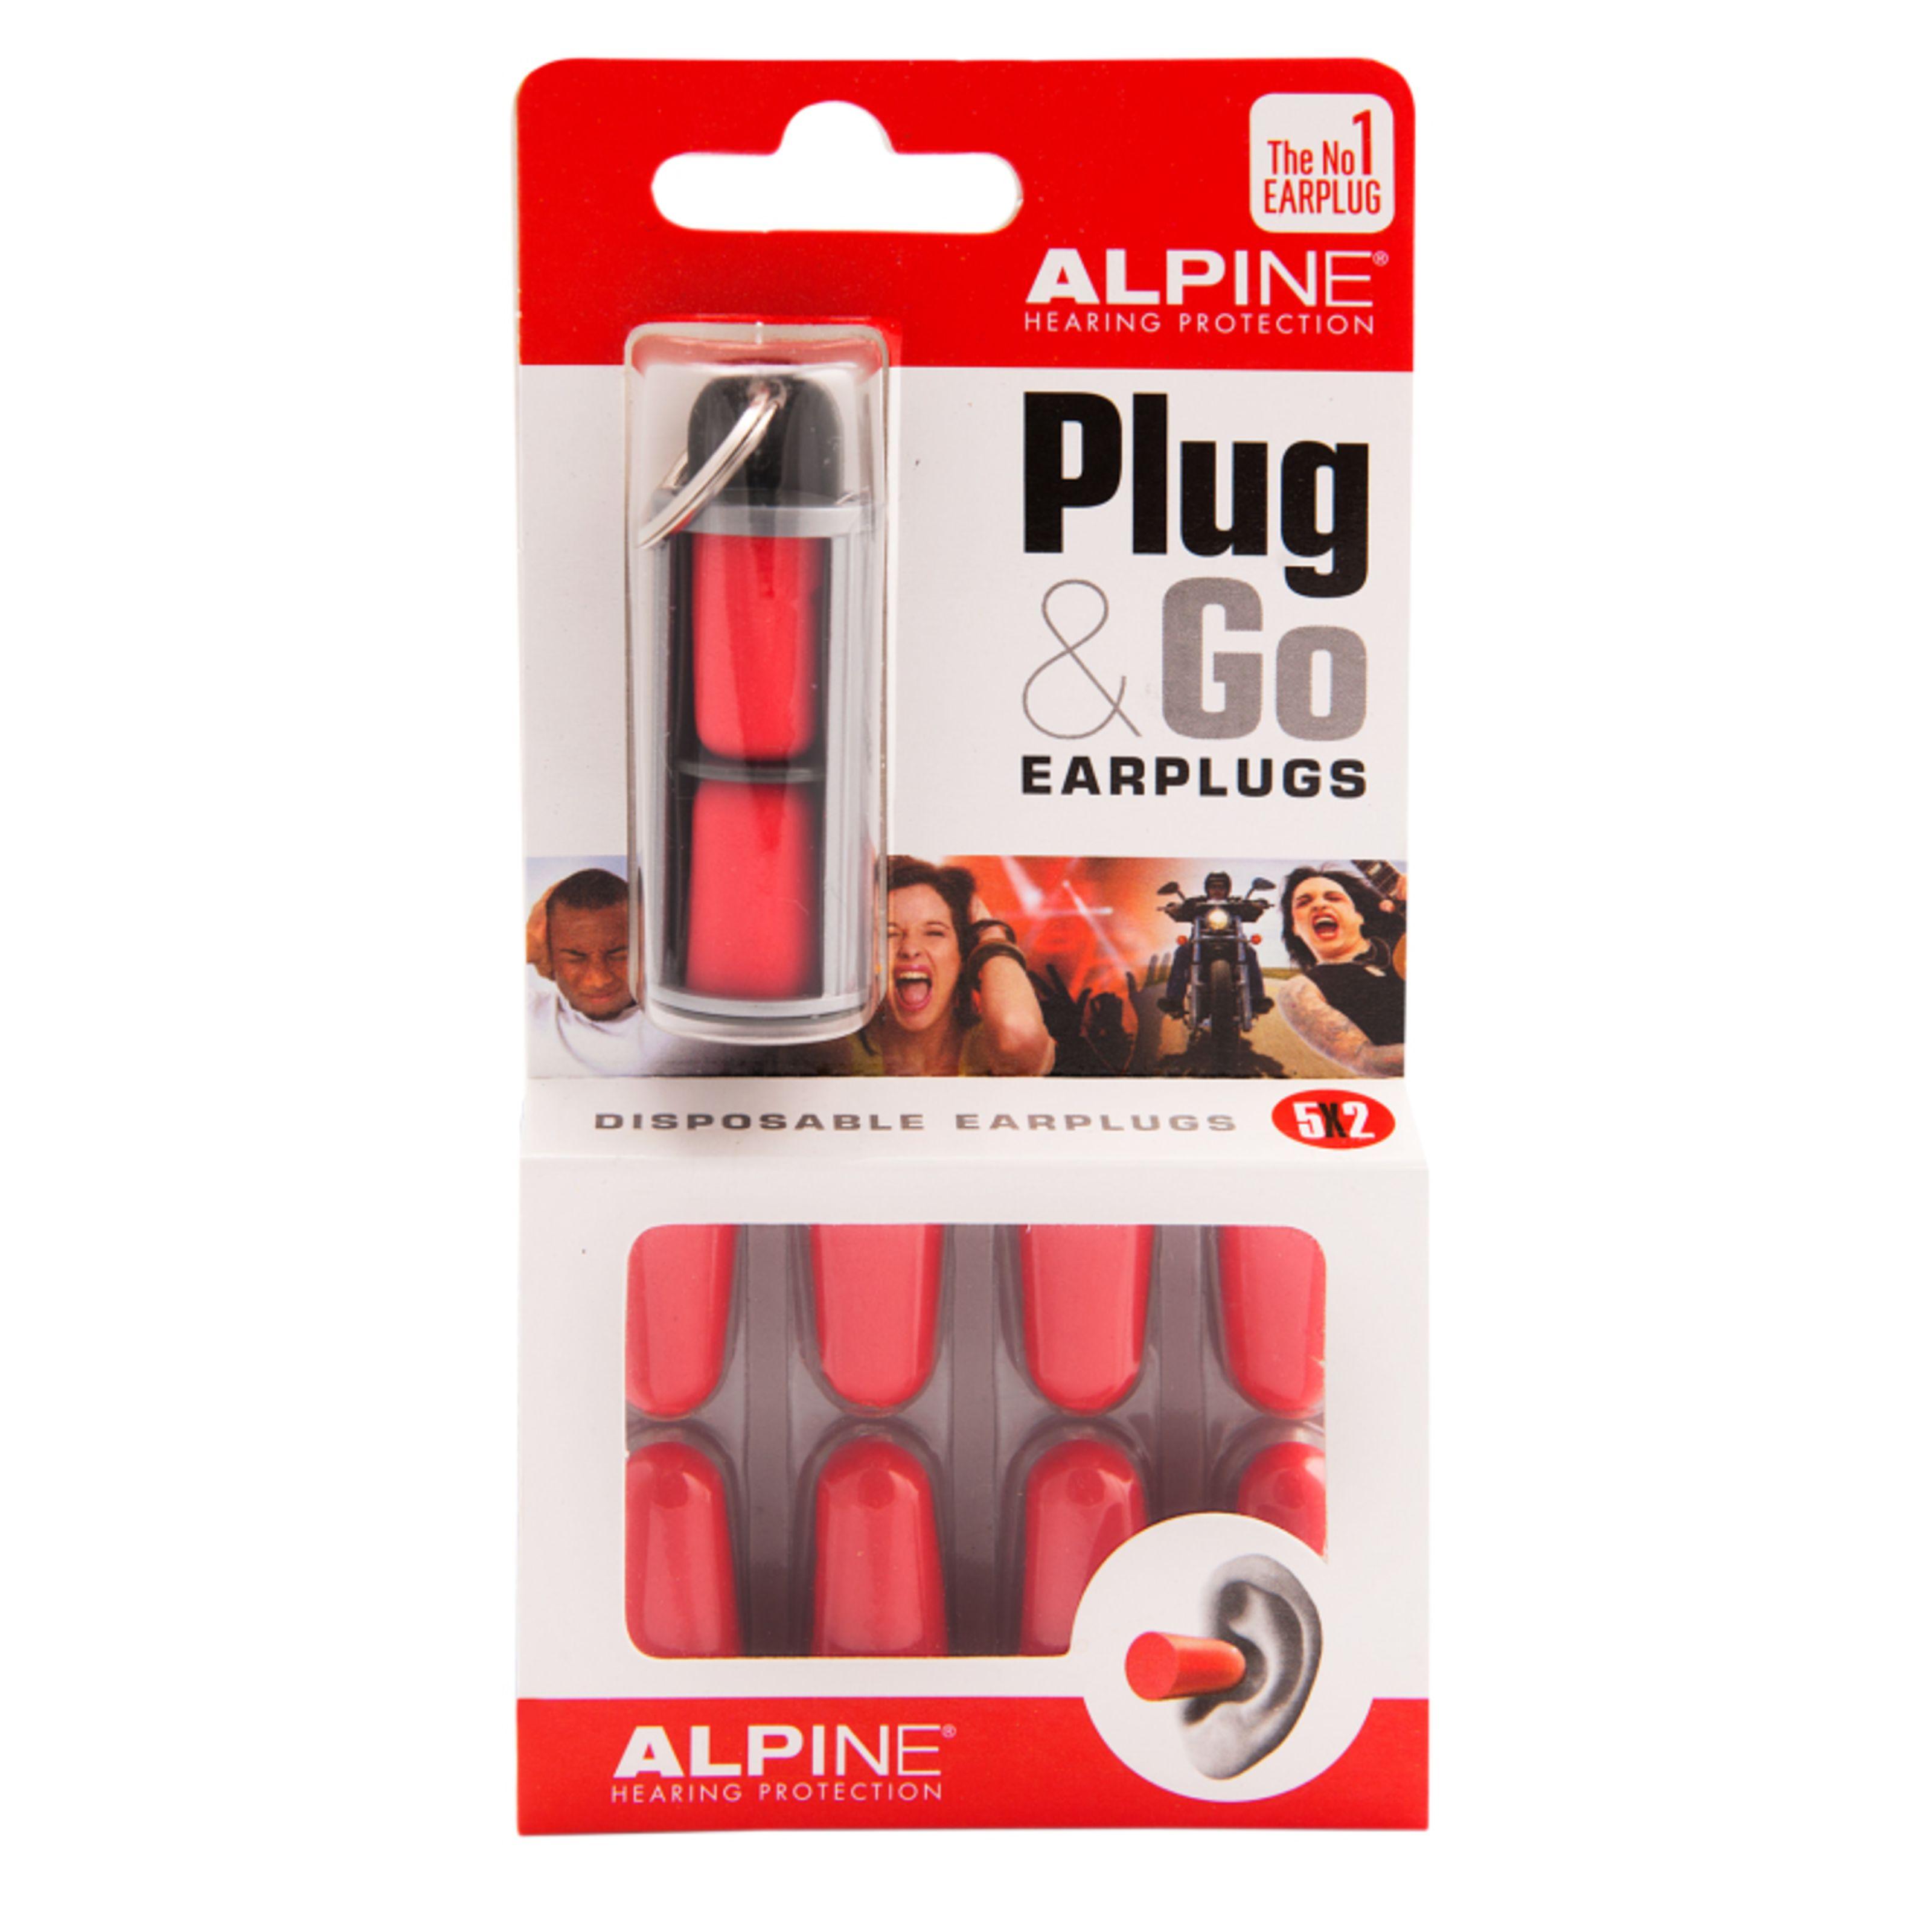 Alpine - Plug&Go Gehörschutz, 5 Paar 111.42.100